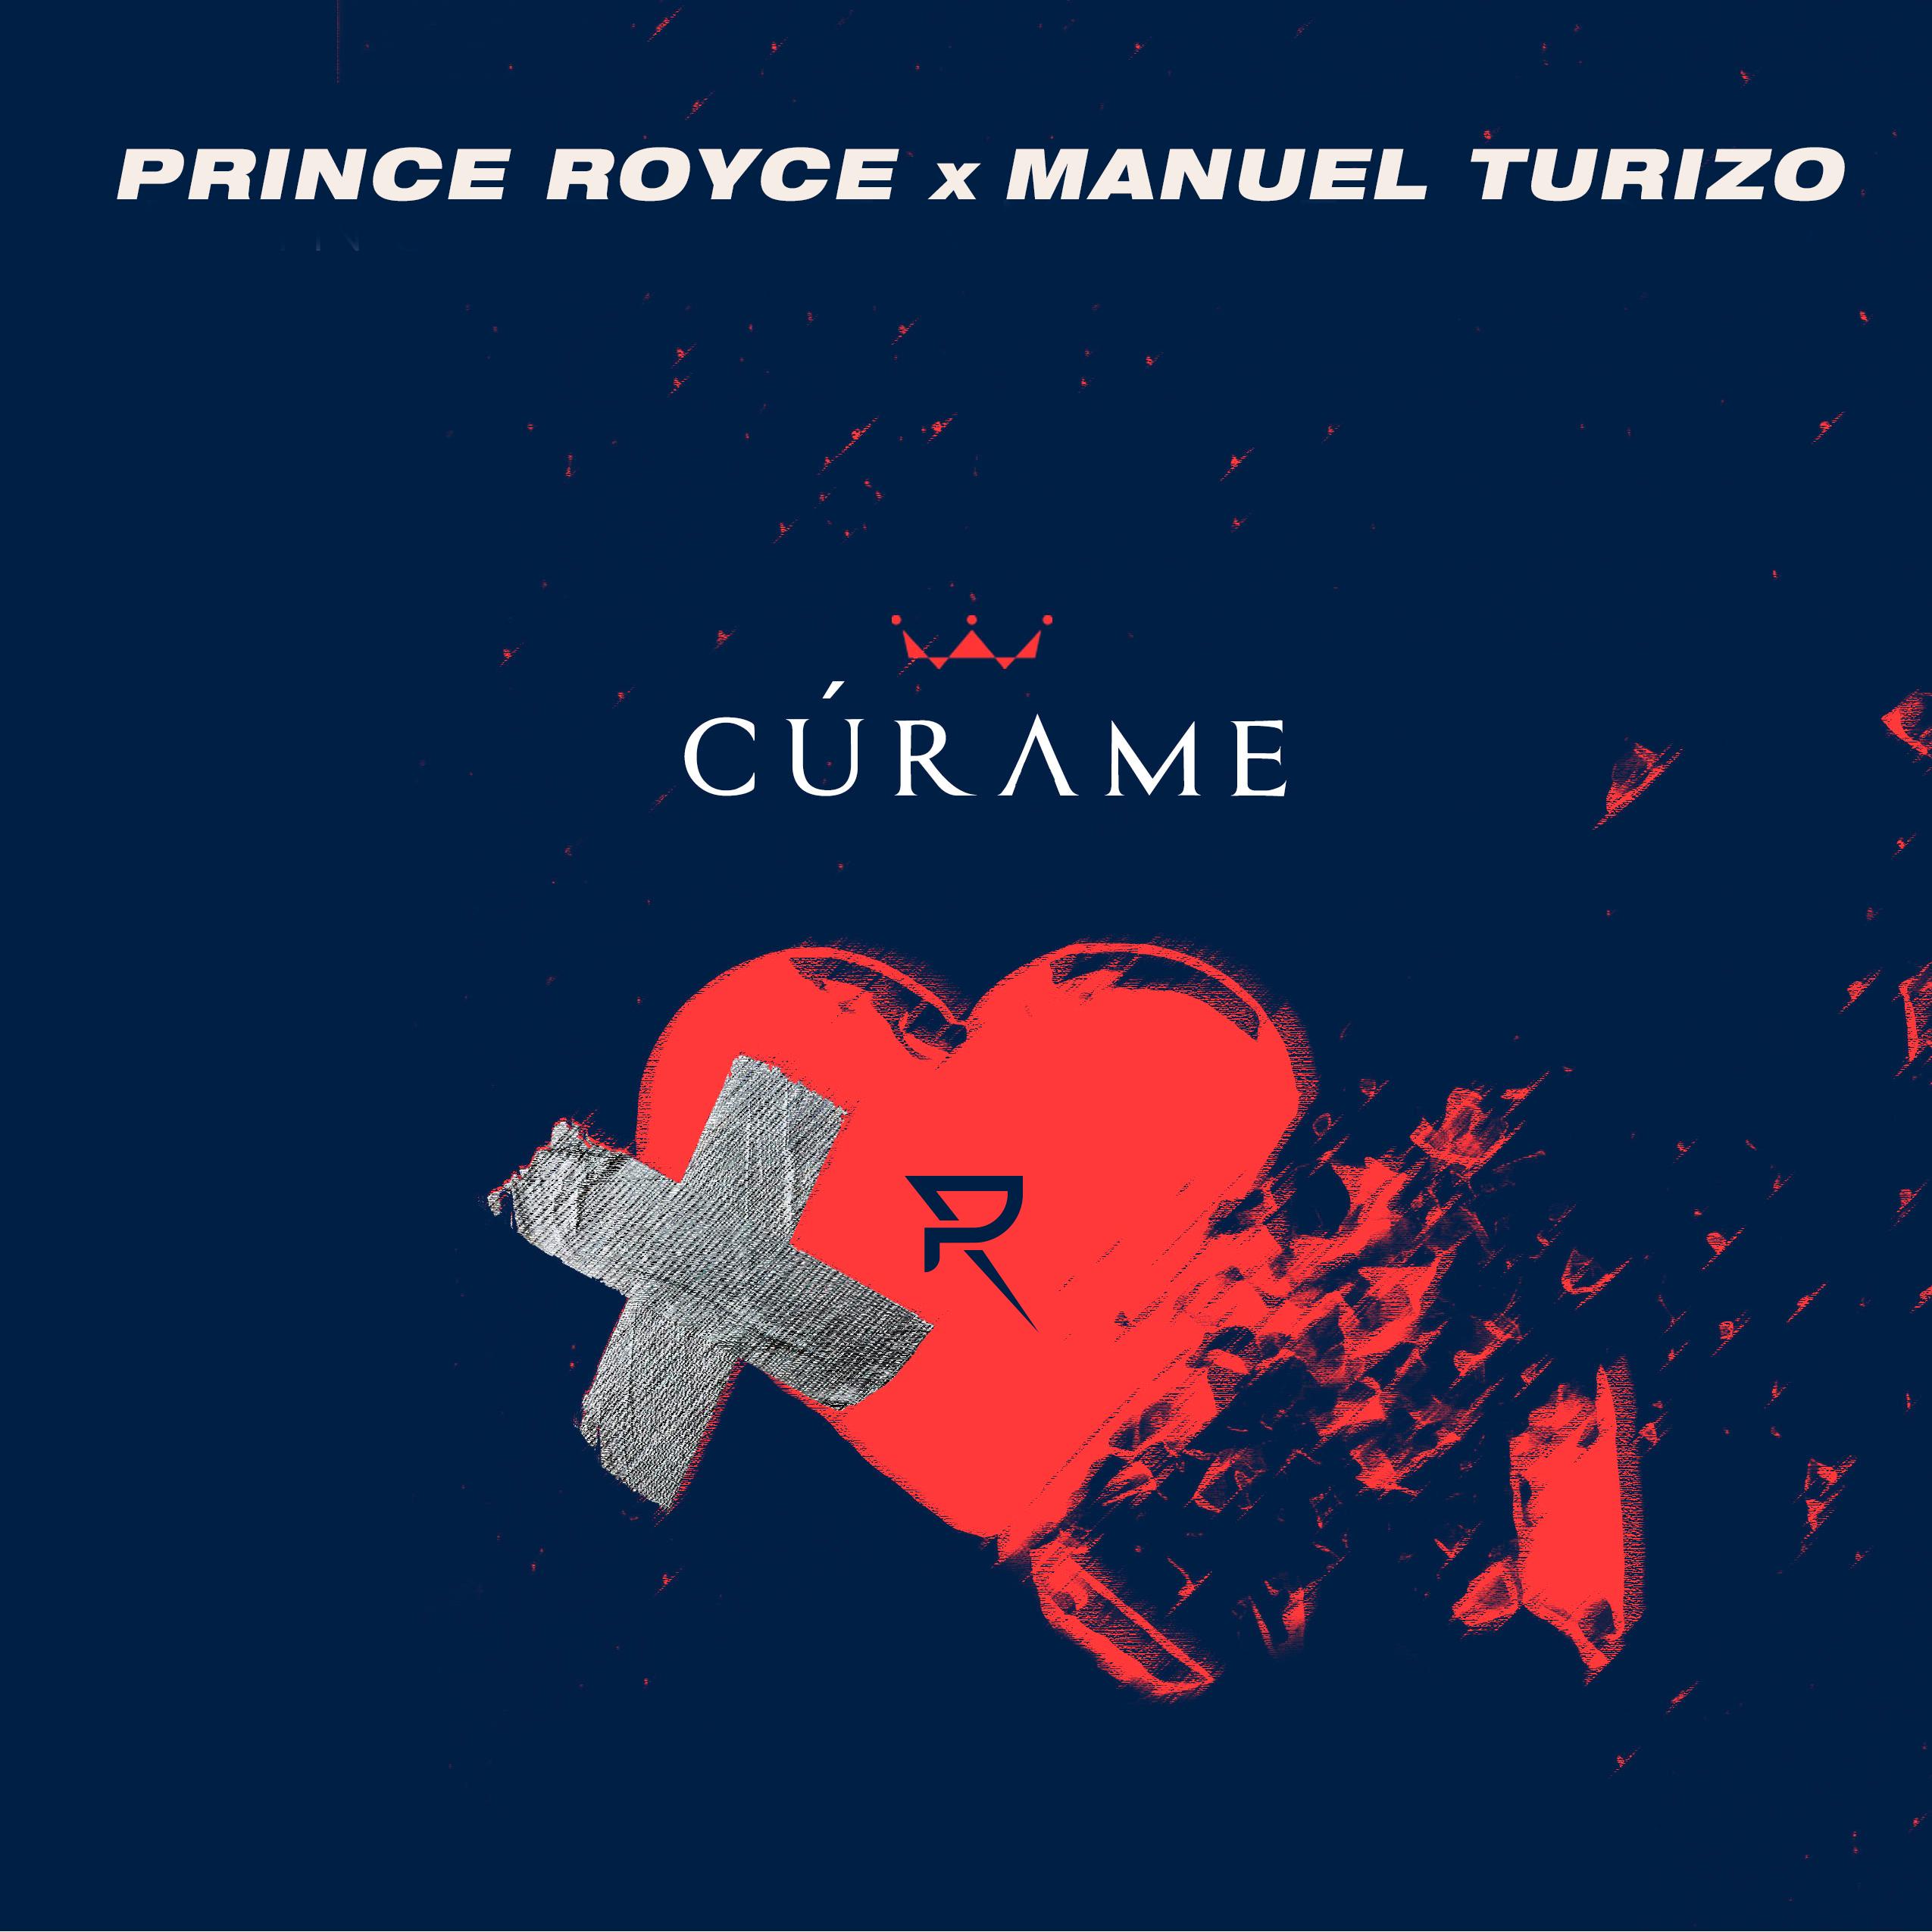 PrinceRoyce_Curame